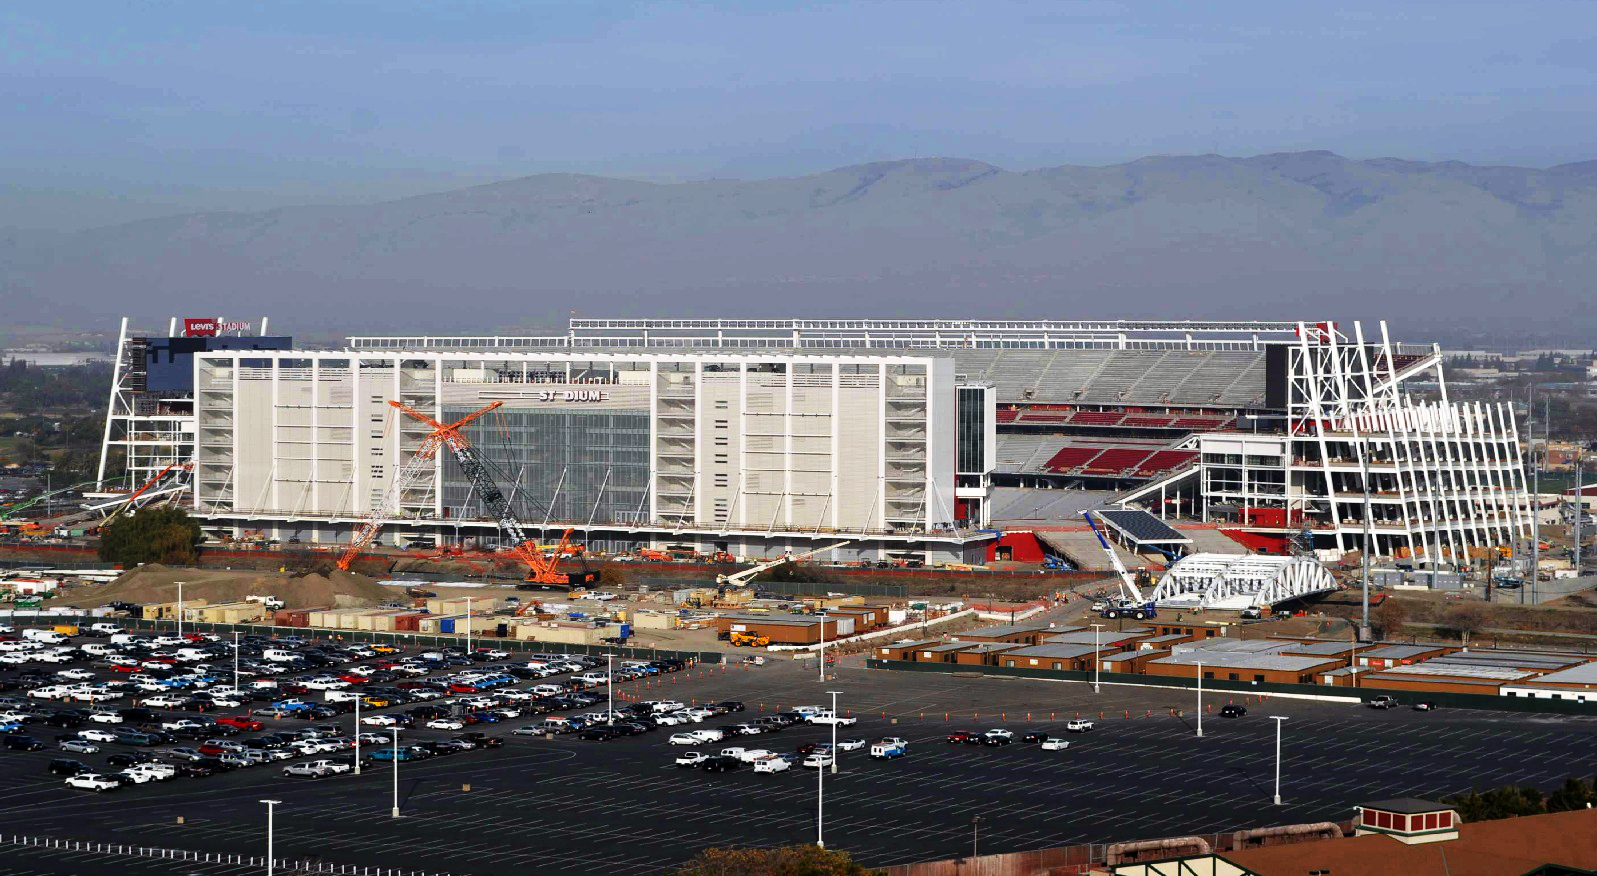 Levi's Stadium- December 2013 views of the new 49ers NFL ...